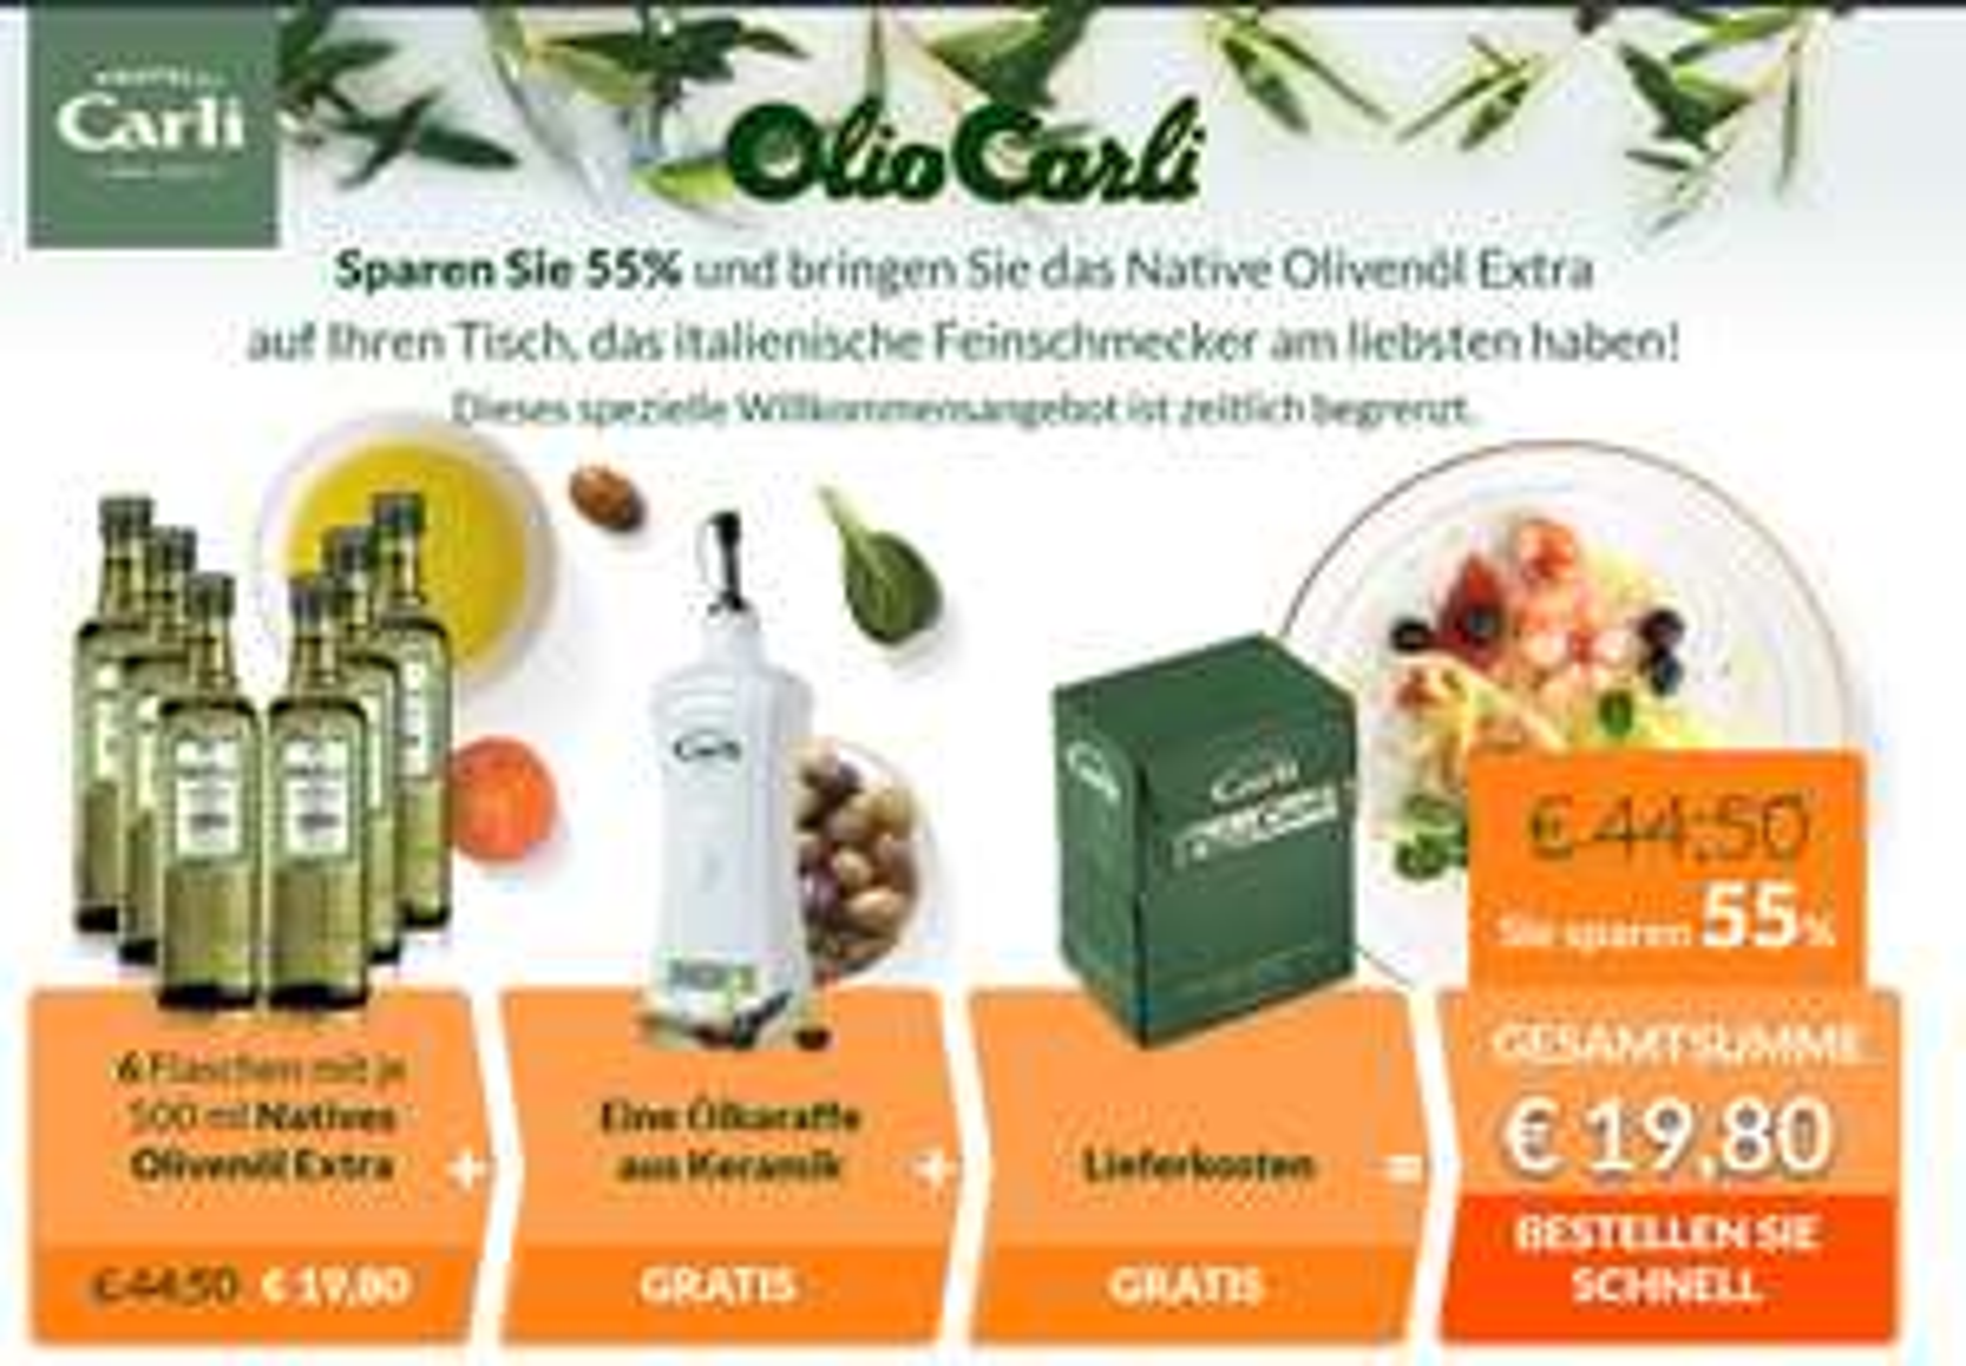 Fratelli Carli 6 Flaschen Natives Olivenöl Extra je 500ml + Ölkaraffe als Neukunde oder Gastbesteller